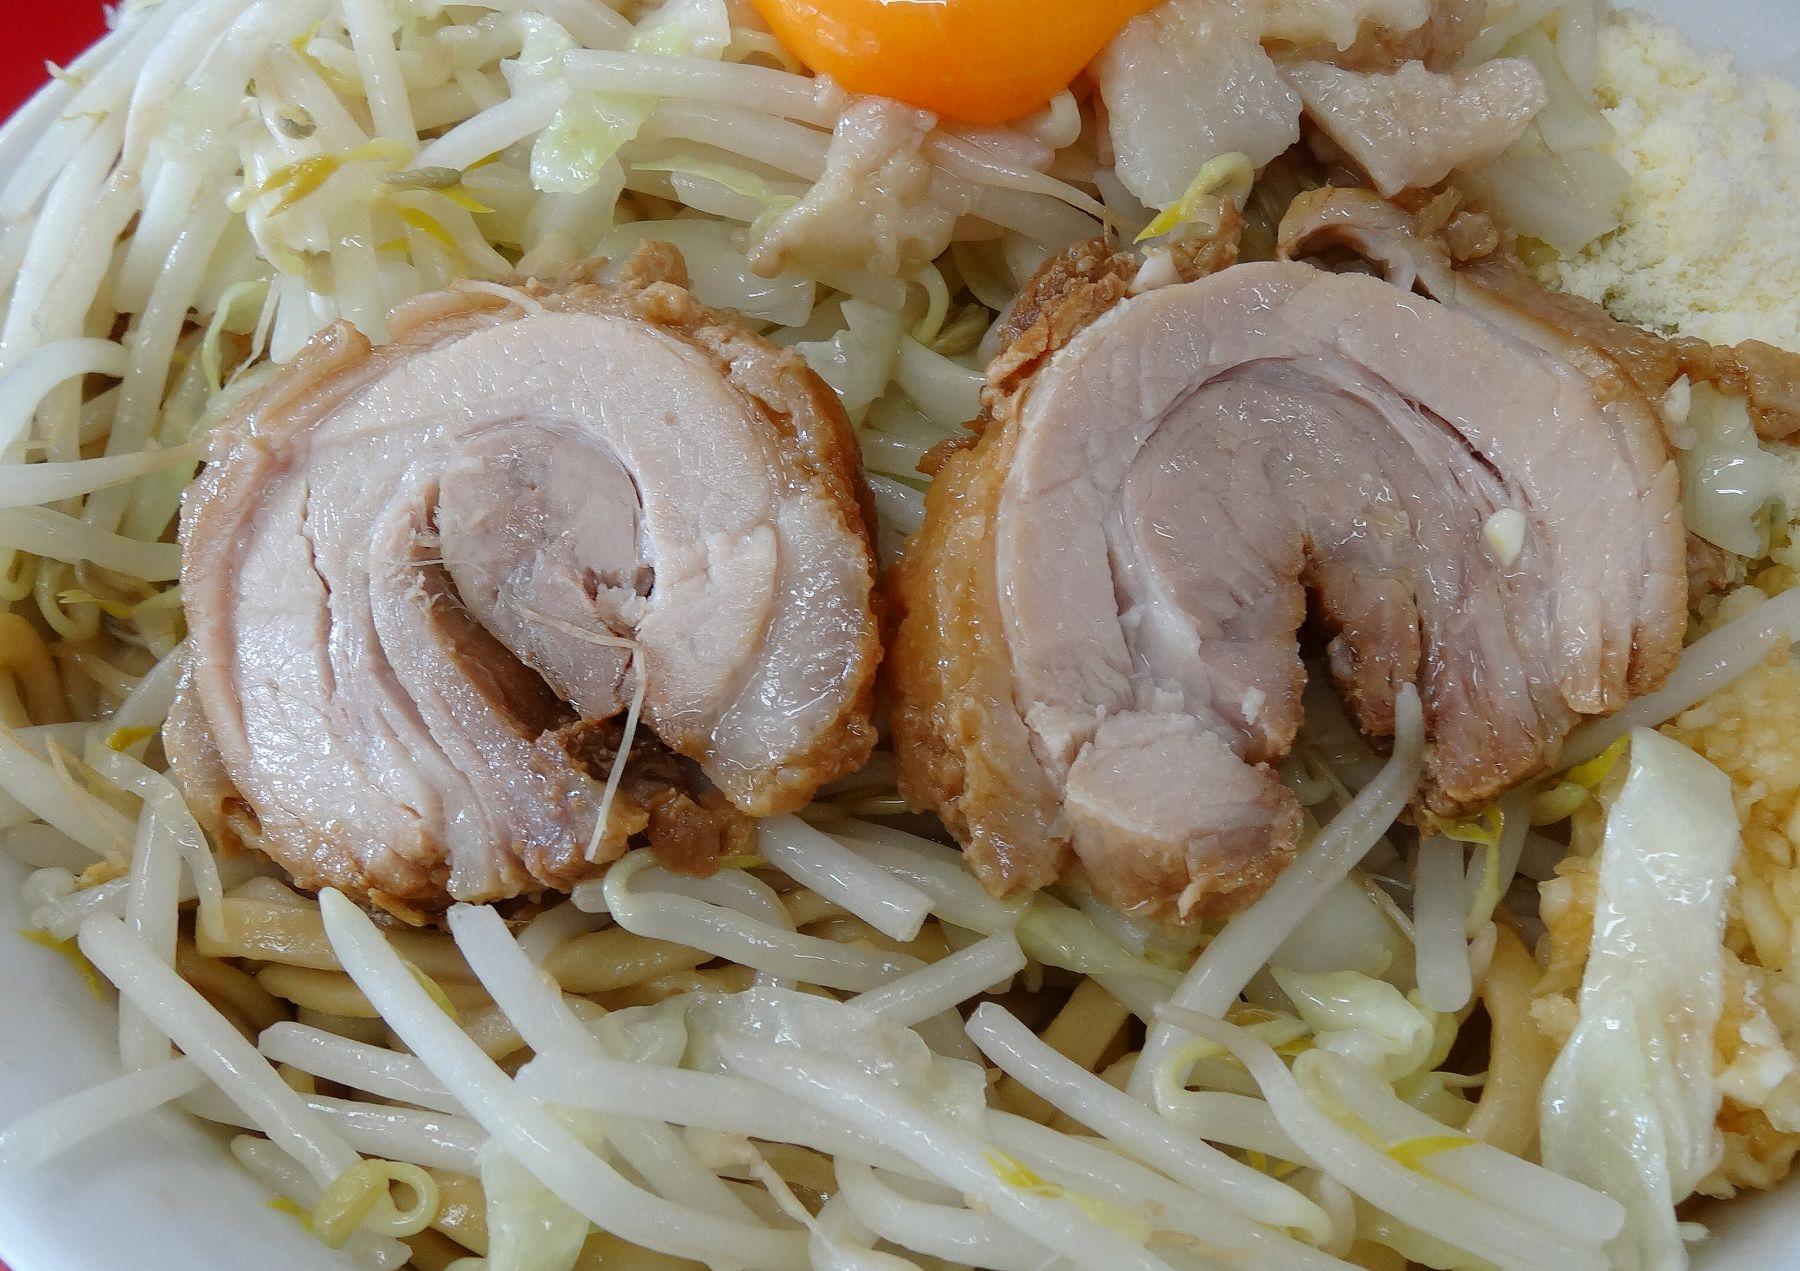 20120924002fujisawa.jpg